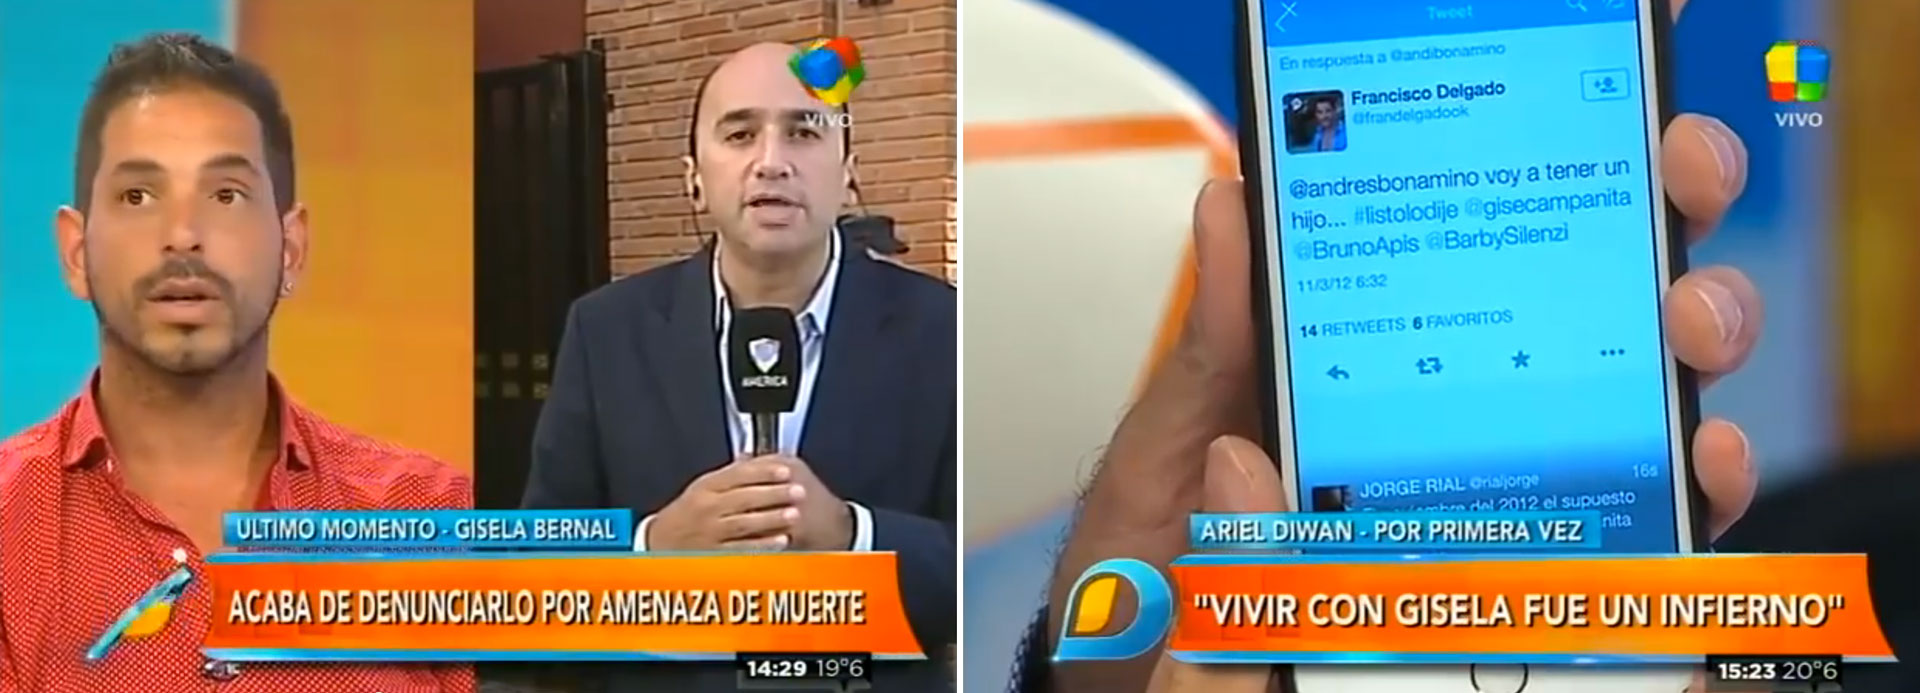 Amorales_bernal_2_caja